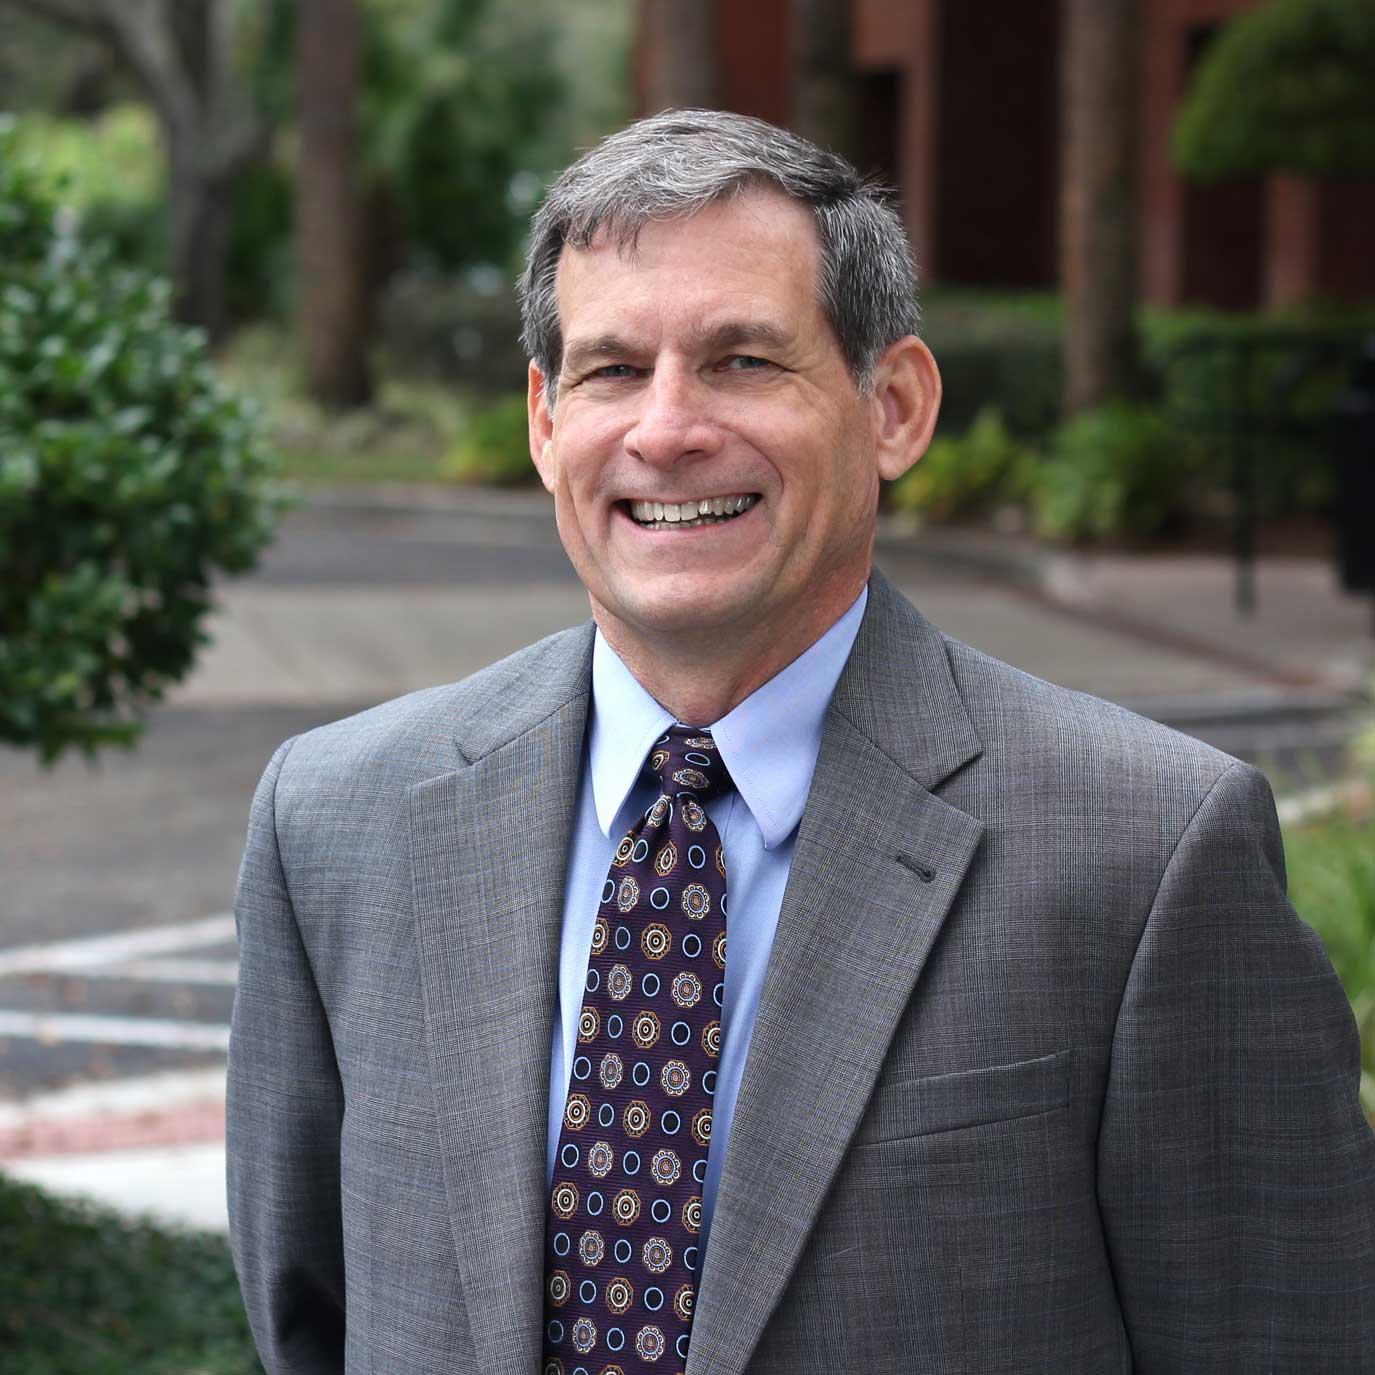 Attorney Jim Miller